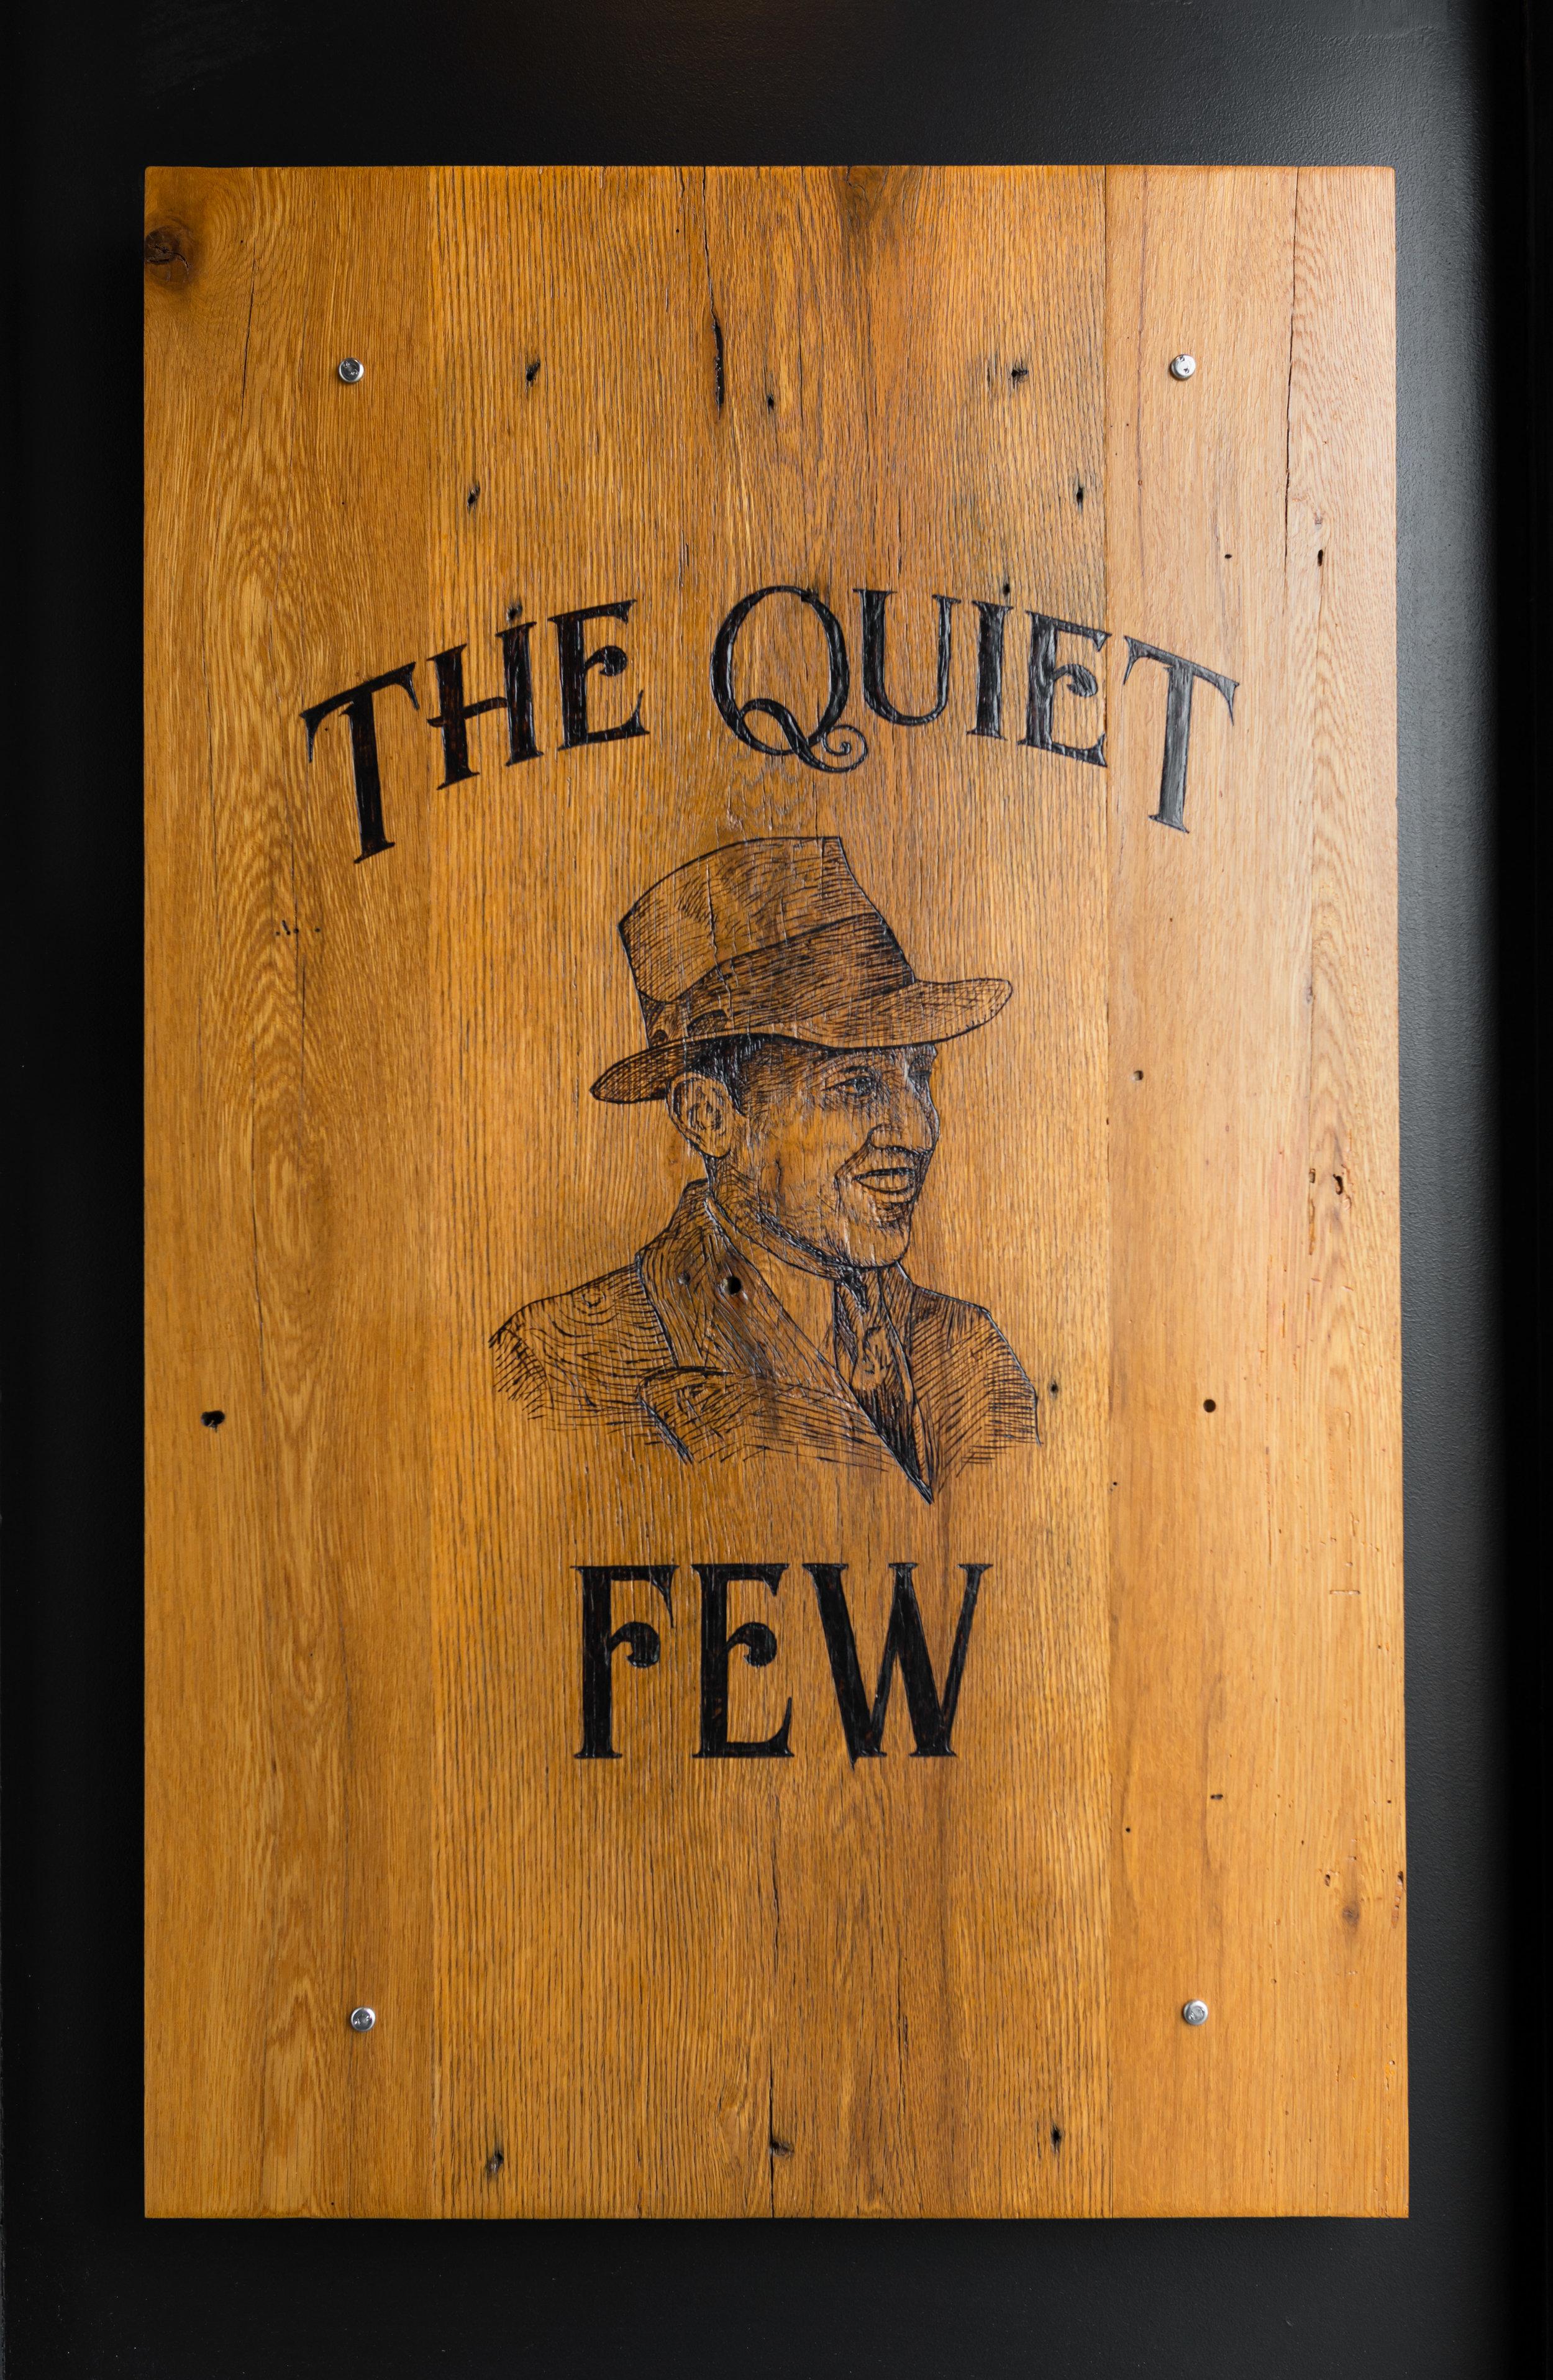 QuietFew-3_2.jpg